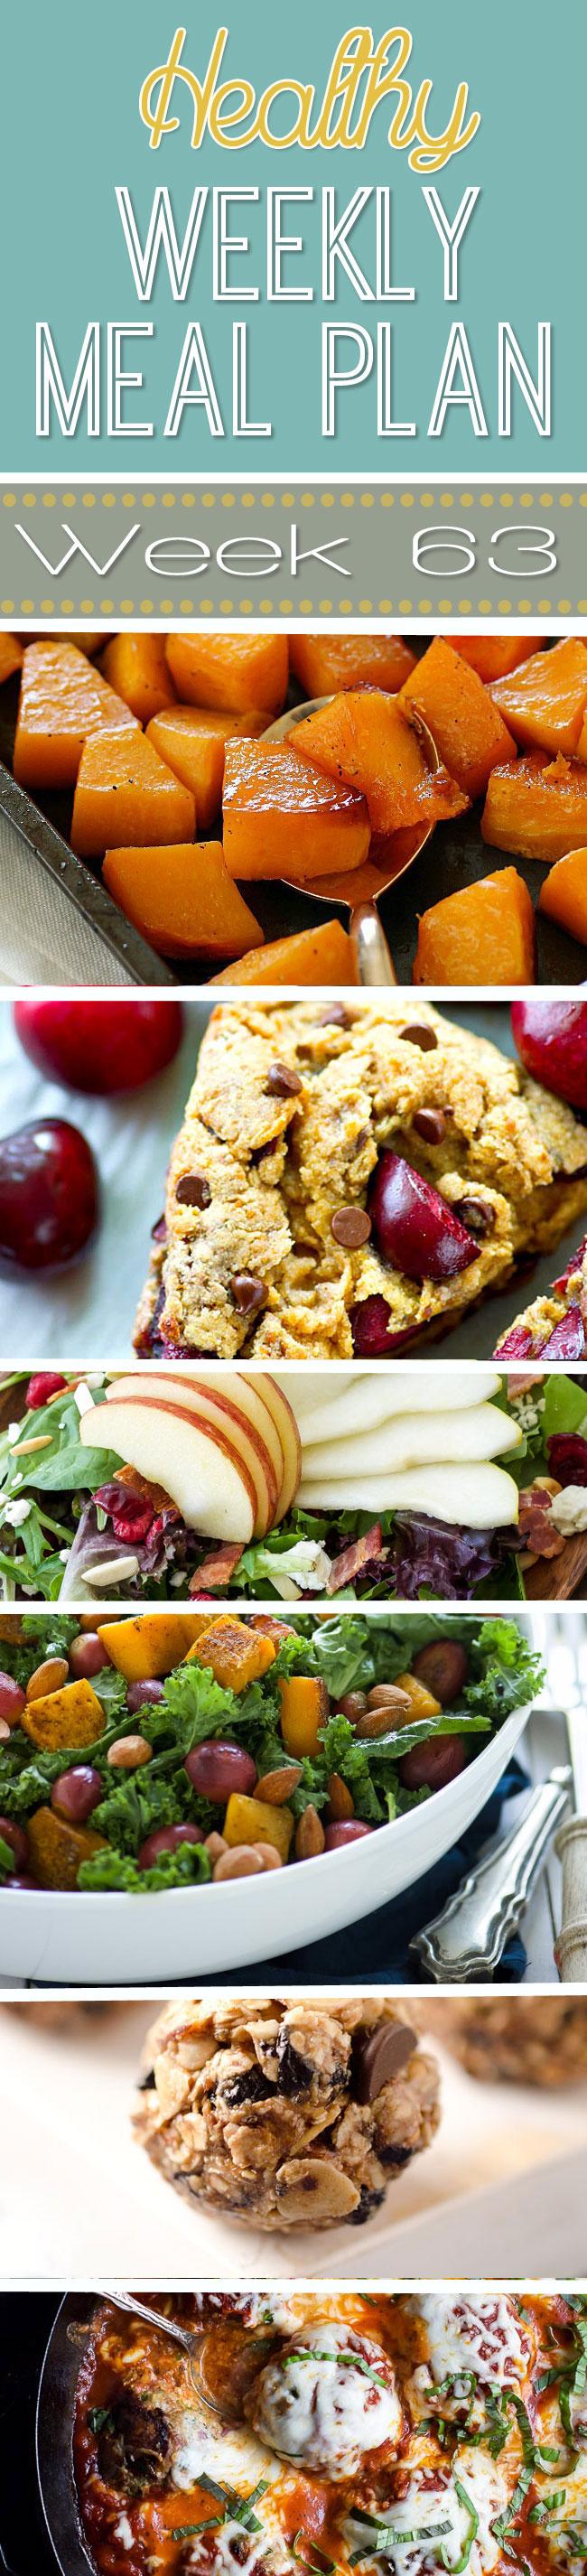 Healthy Weekly Meal Plan #63